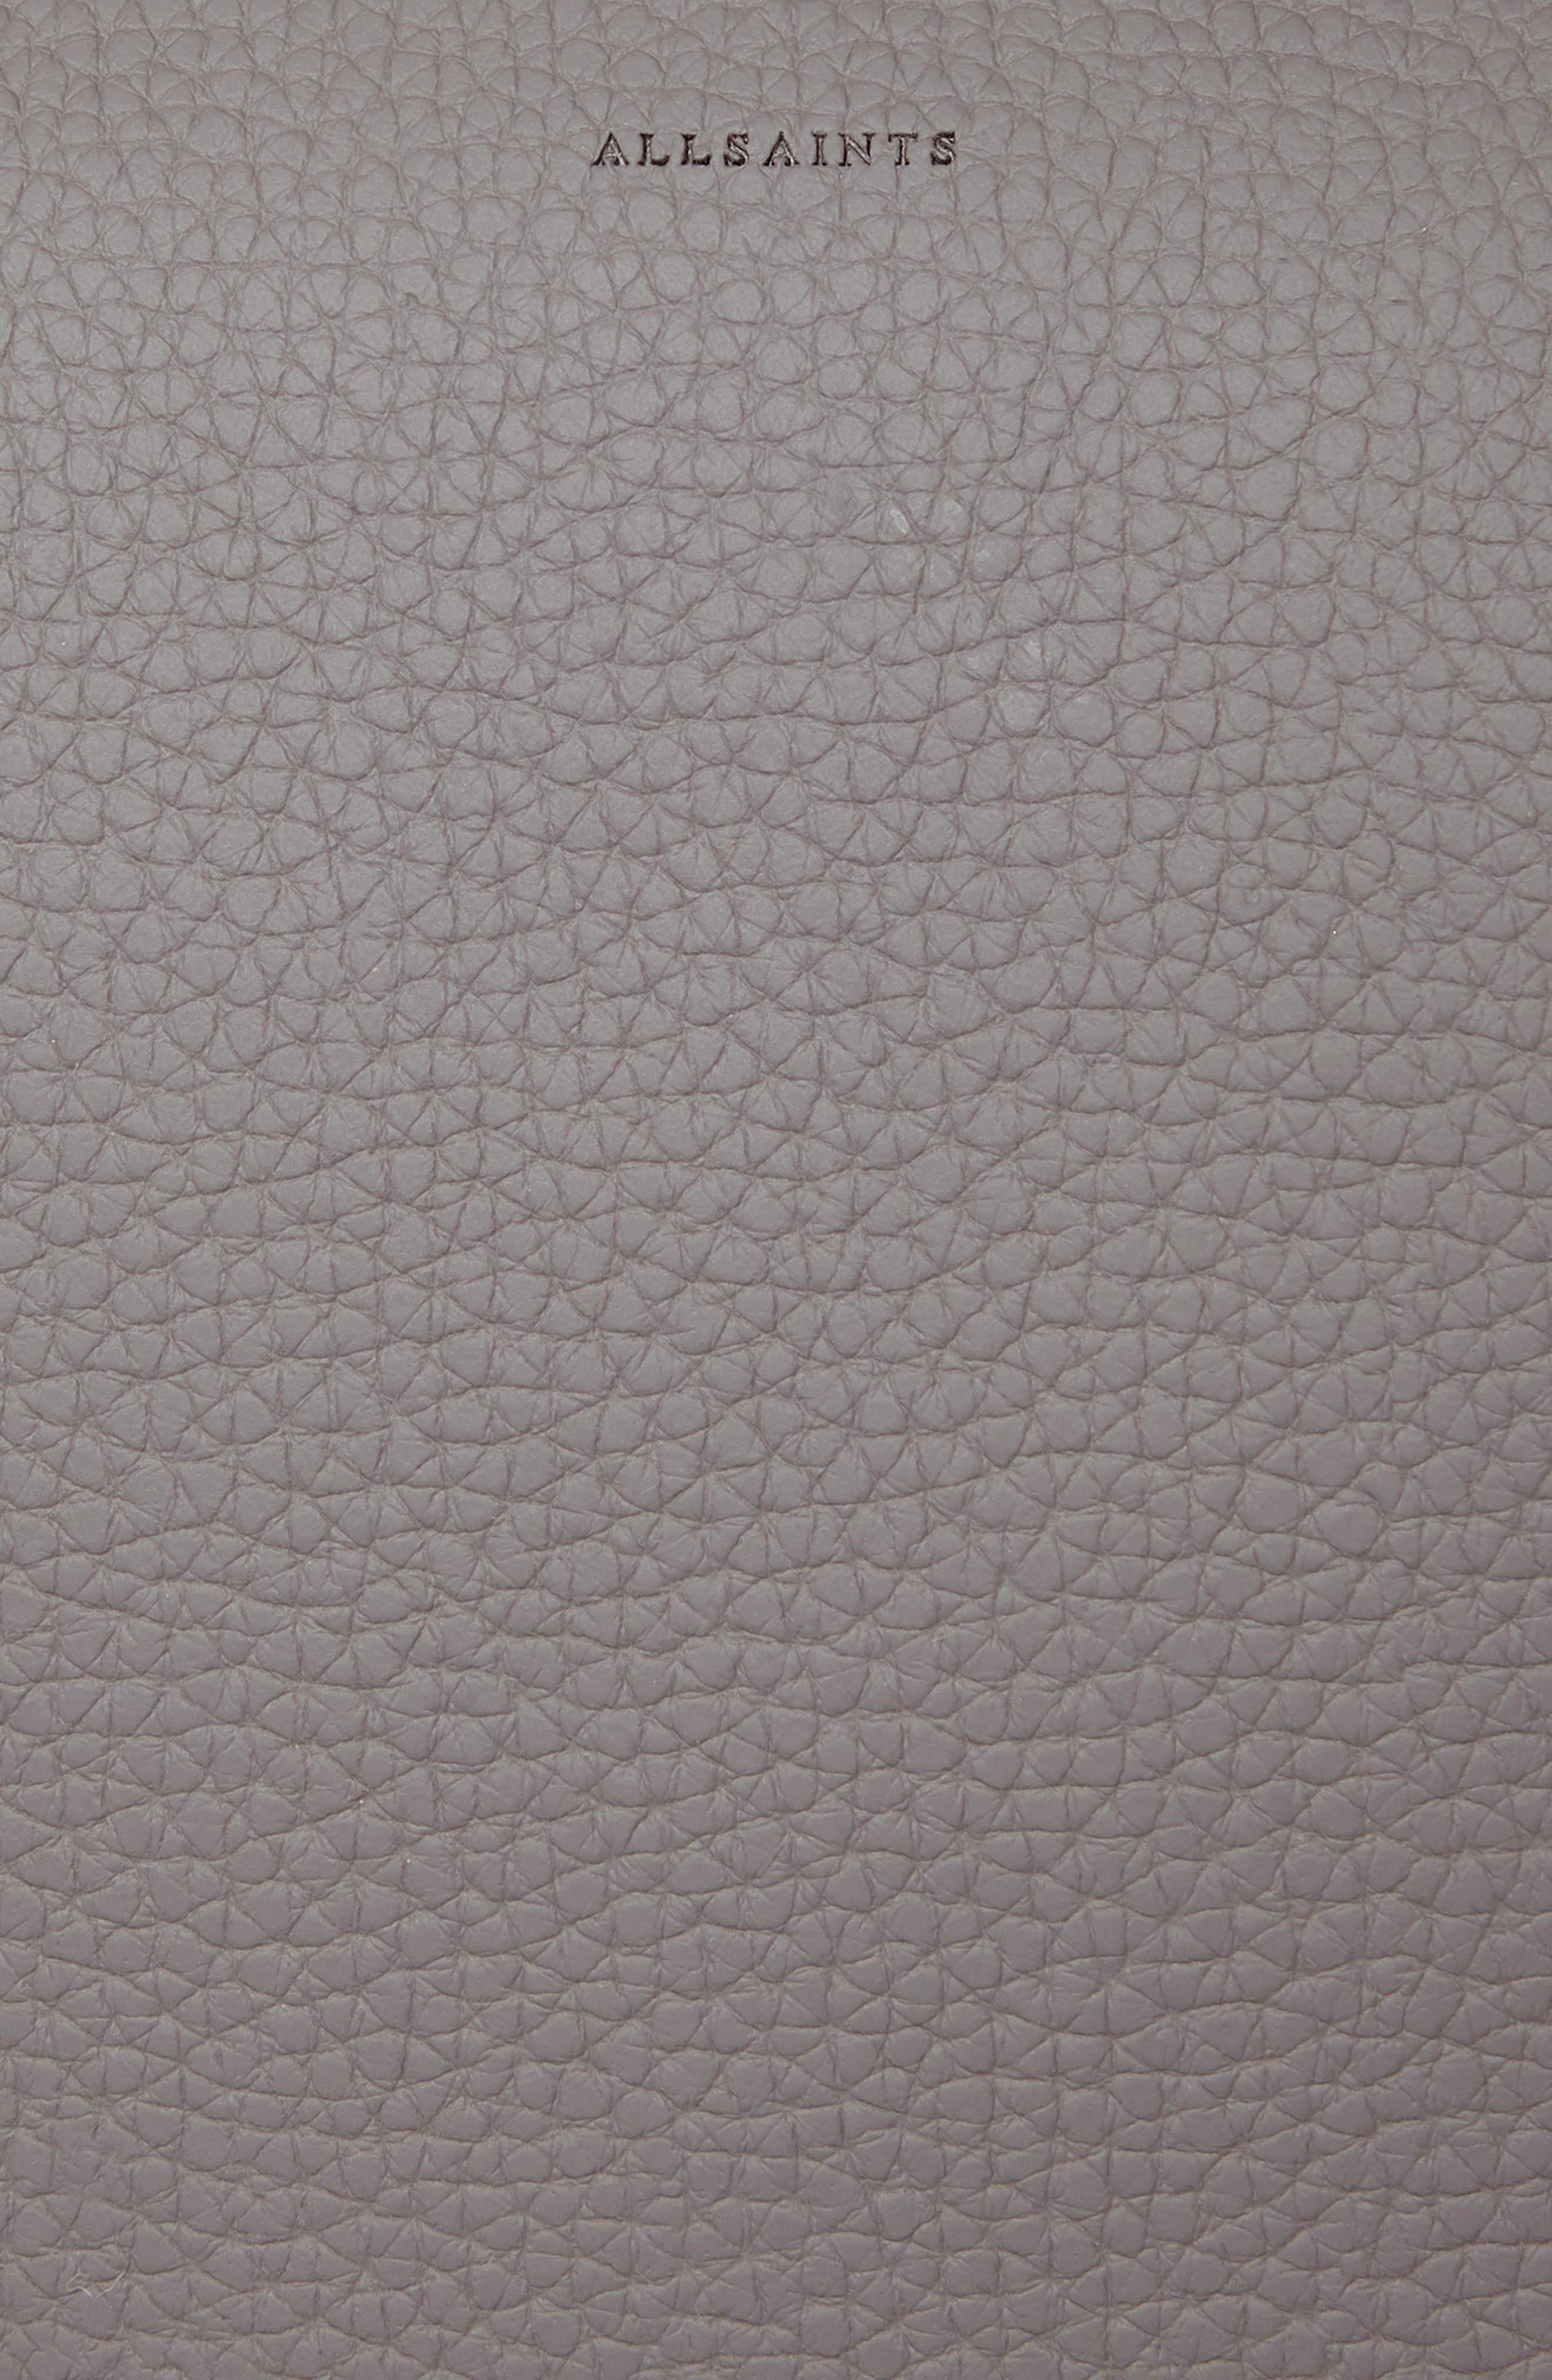 ALLSAINTS, 'Kita' Leather Shoulder/Crossbody Bag, Alternate thumbnail 7, color, STORM GREY